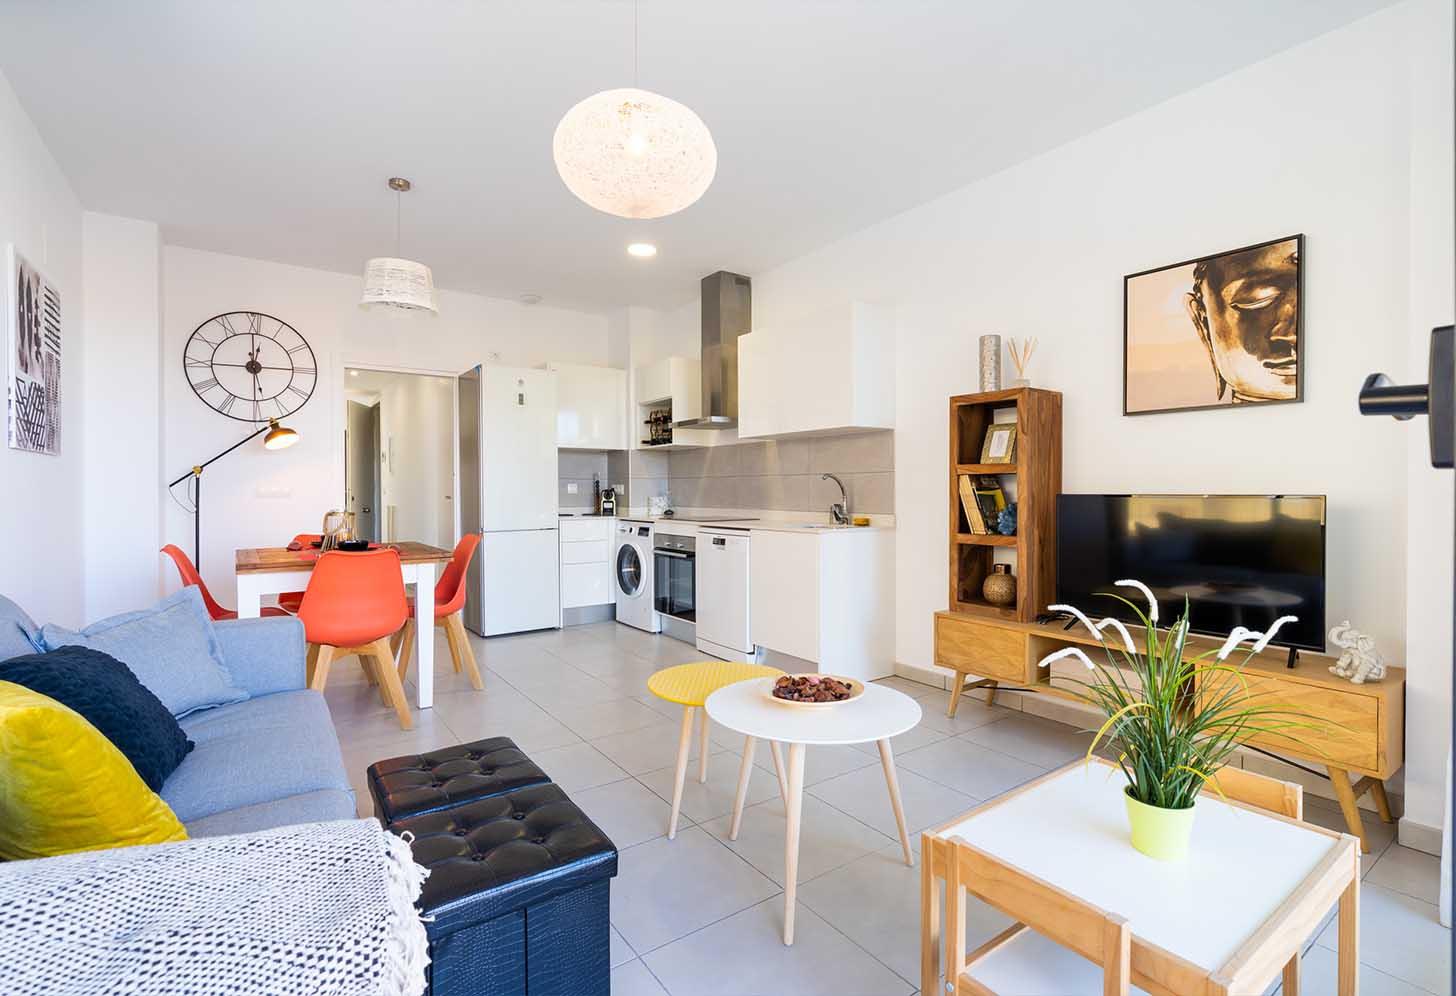 immobilier neuf espagne costa blanca on-m1 calpe beach II salon 2